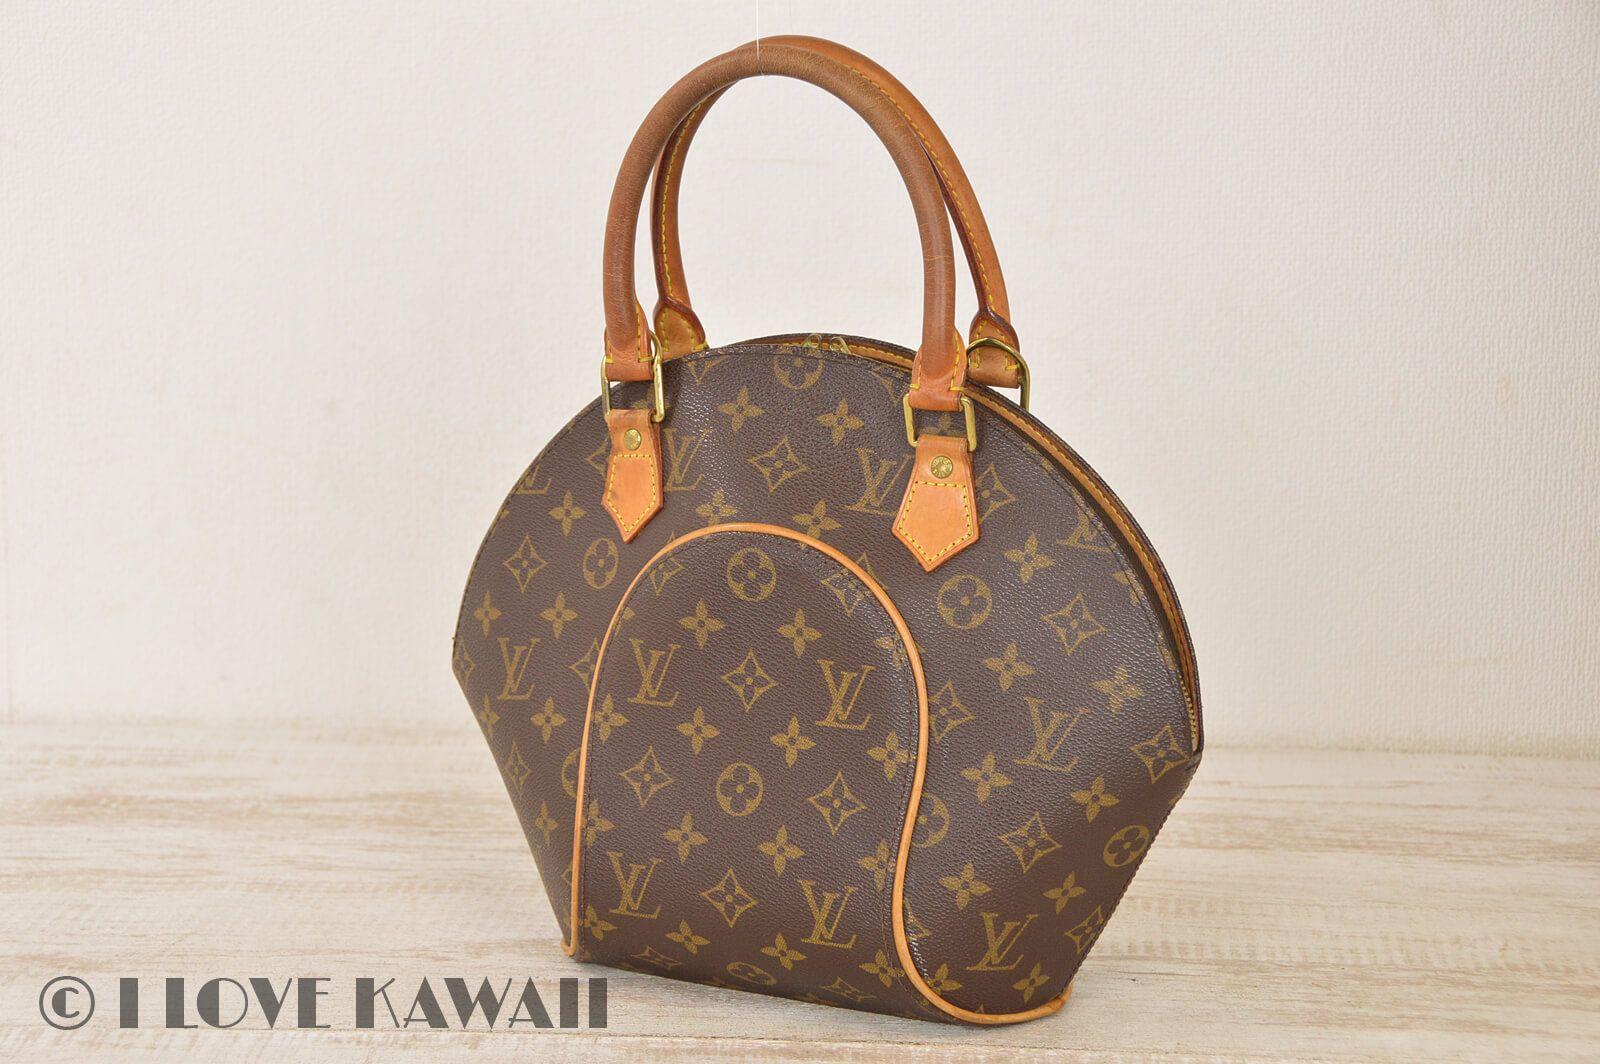 9ff01f6556cf Louis Vuitton Monogram Ellipse PM Hand Bag M51127